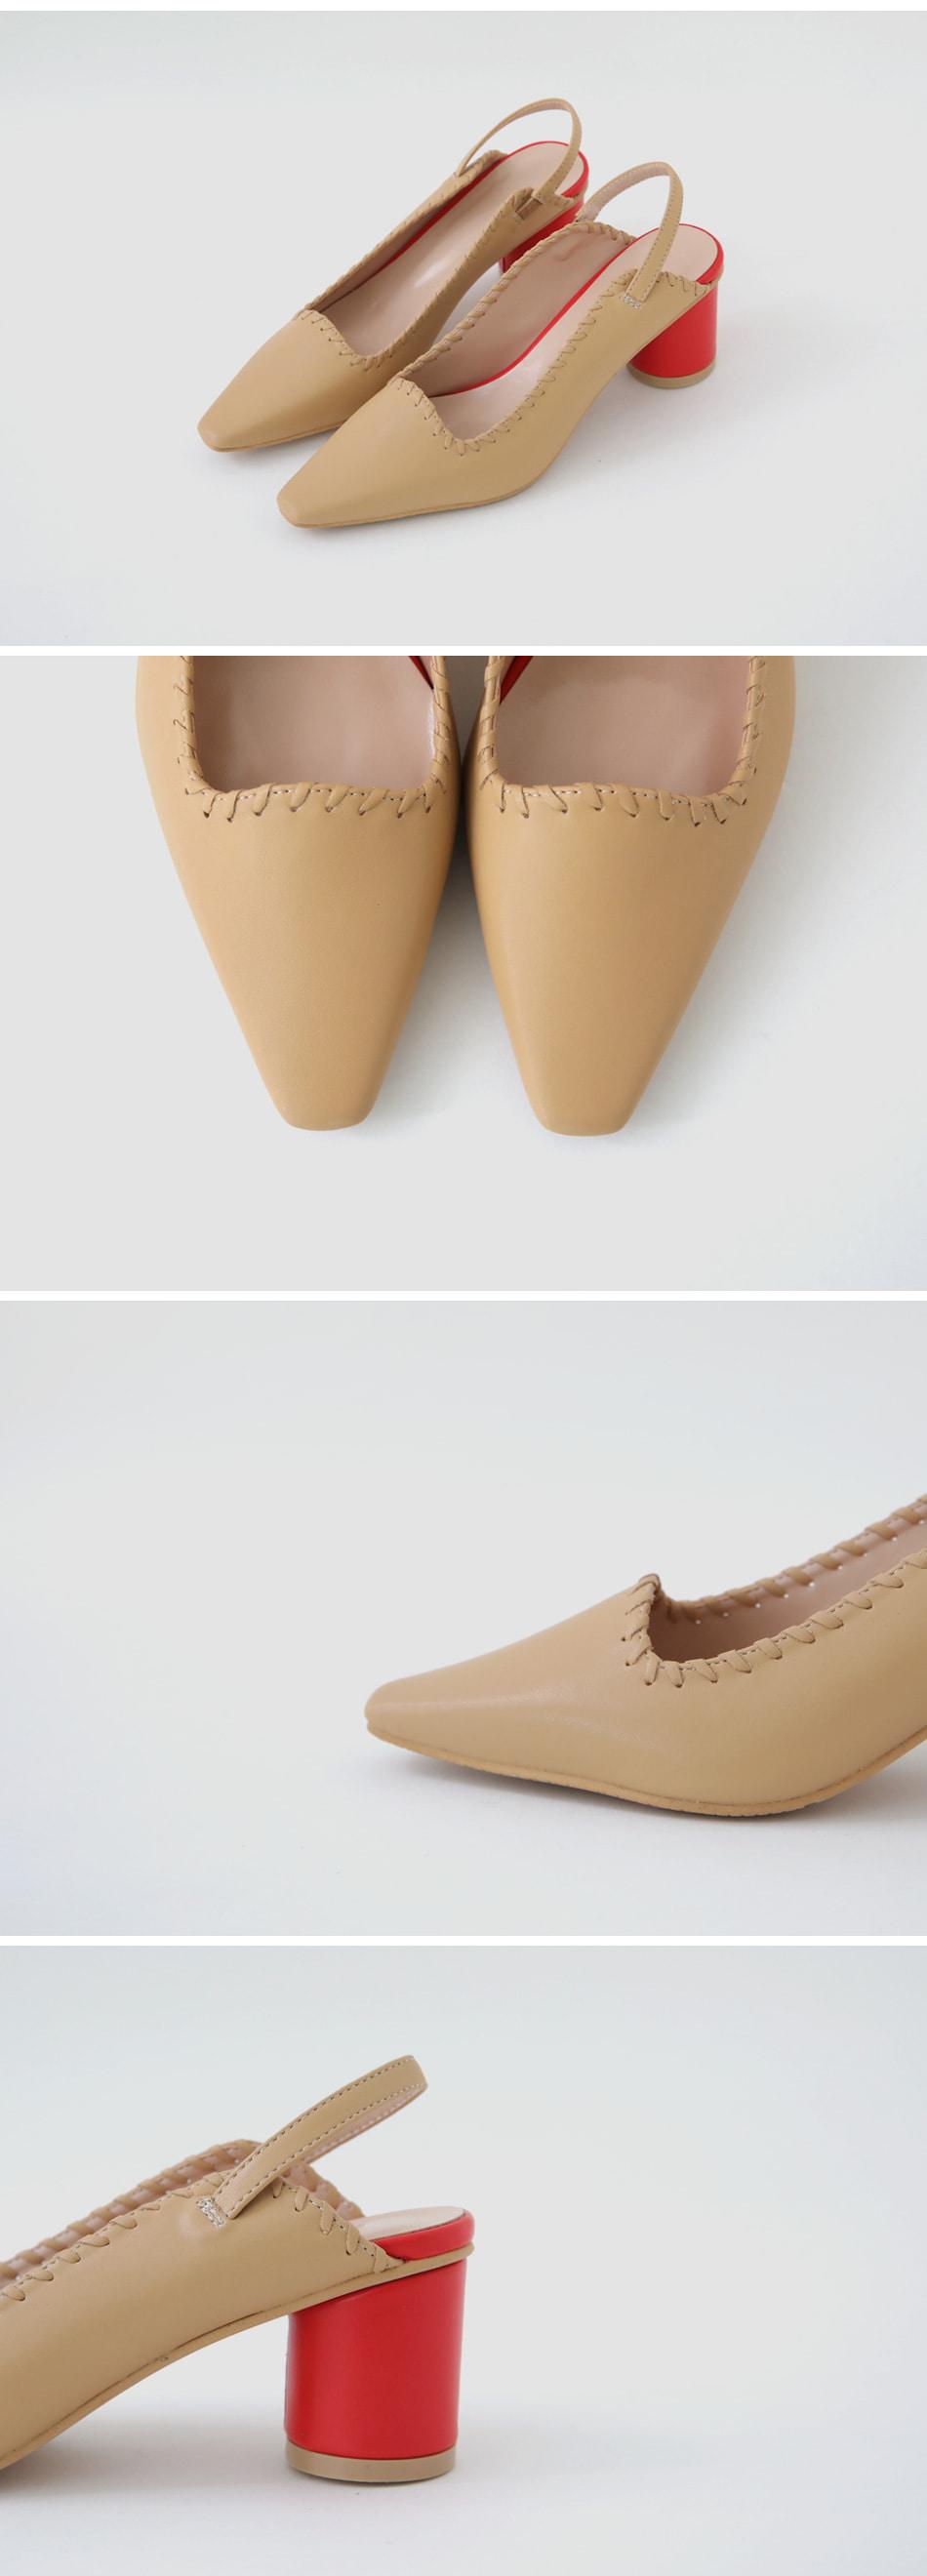 Monican Slingback Middle Heel Pumps 6cm